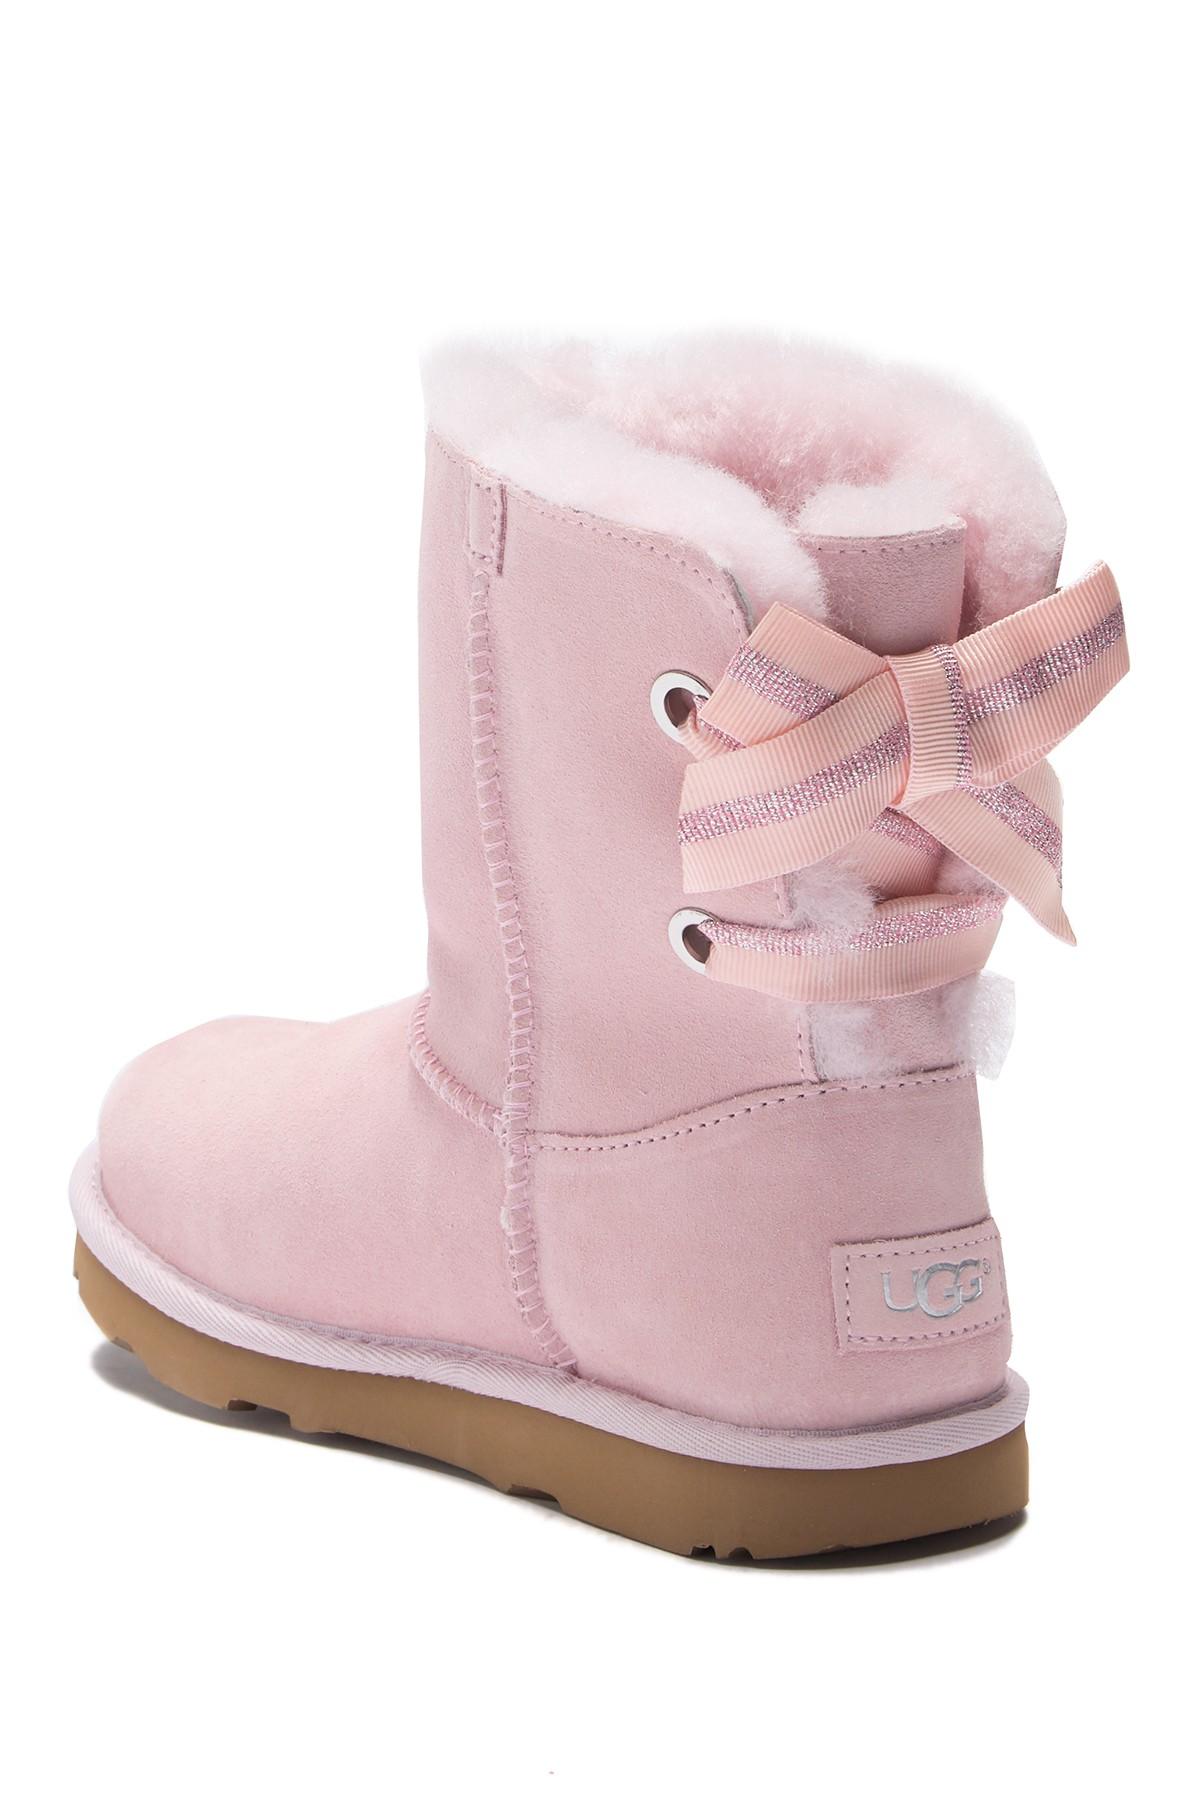 f81fd4346b Nordstrom Rack: Kids' UGG Boots – only $60 (reg $160)! – Wear It For ...